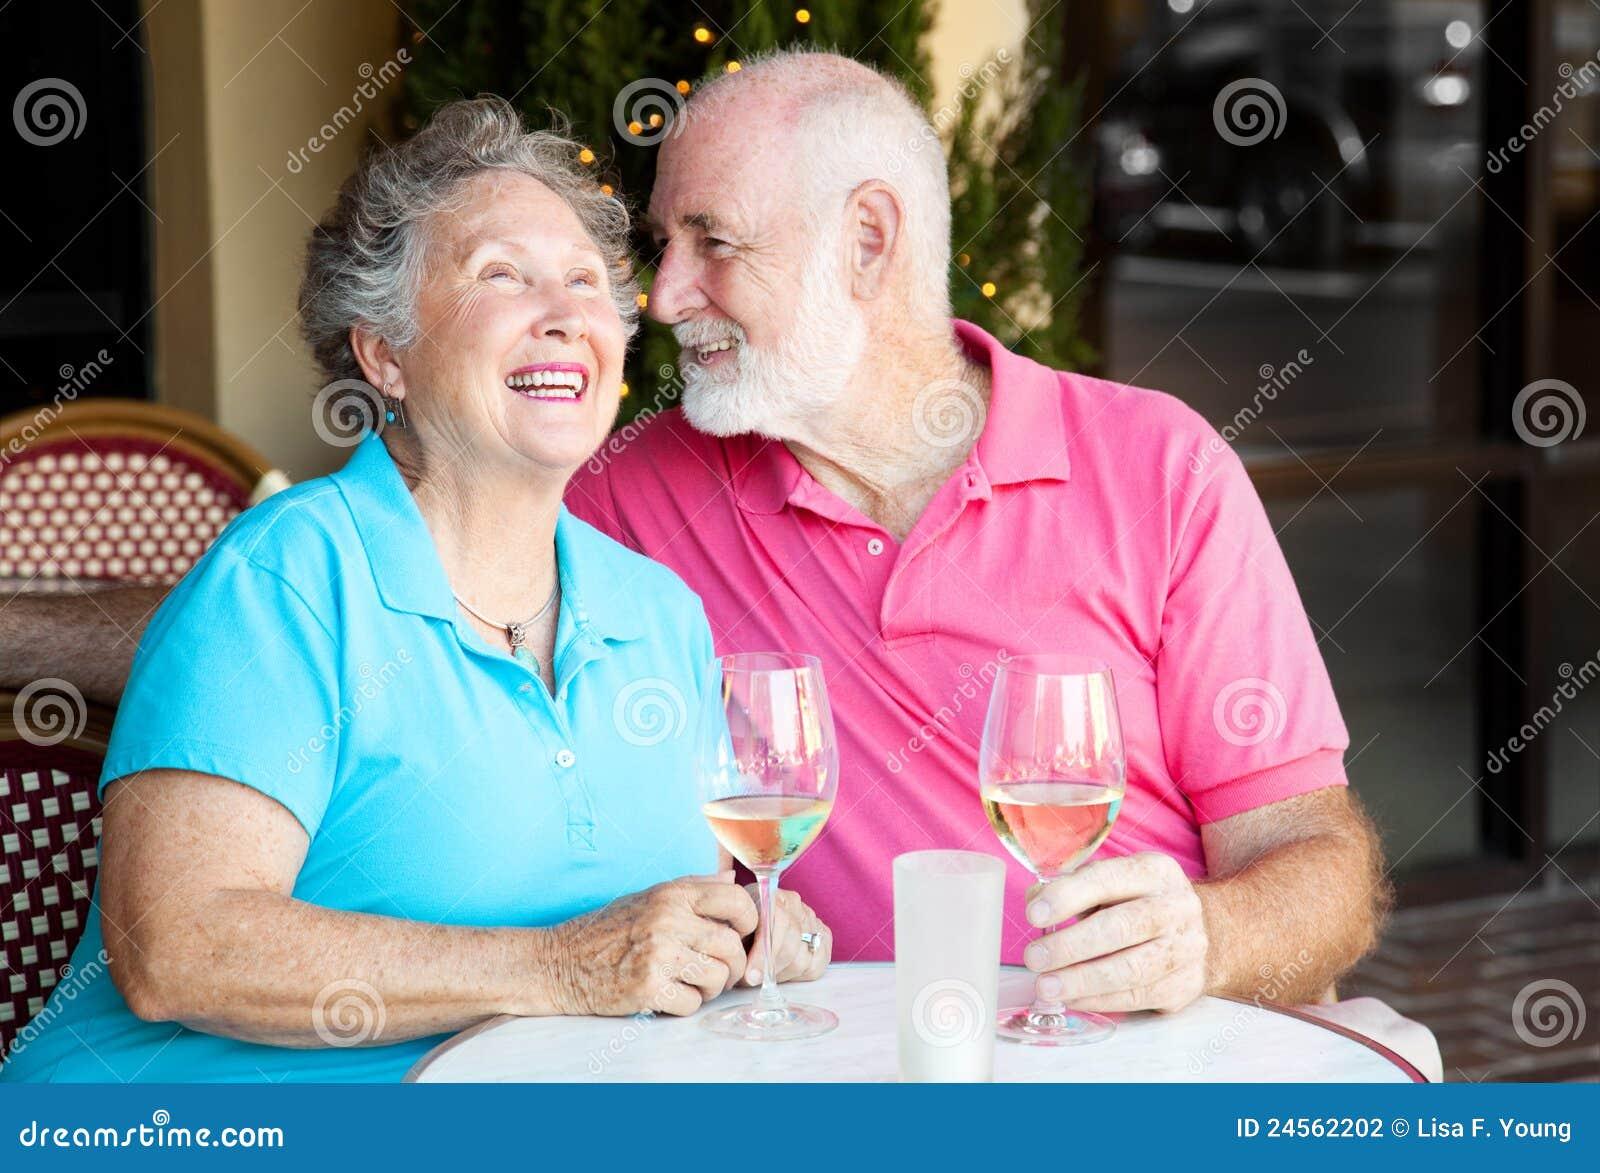 dating filipina online